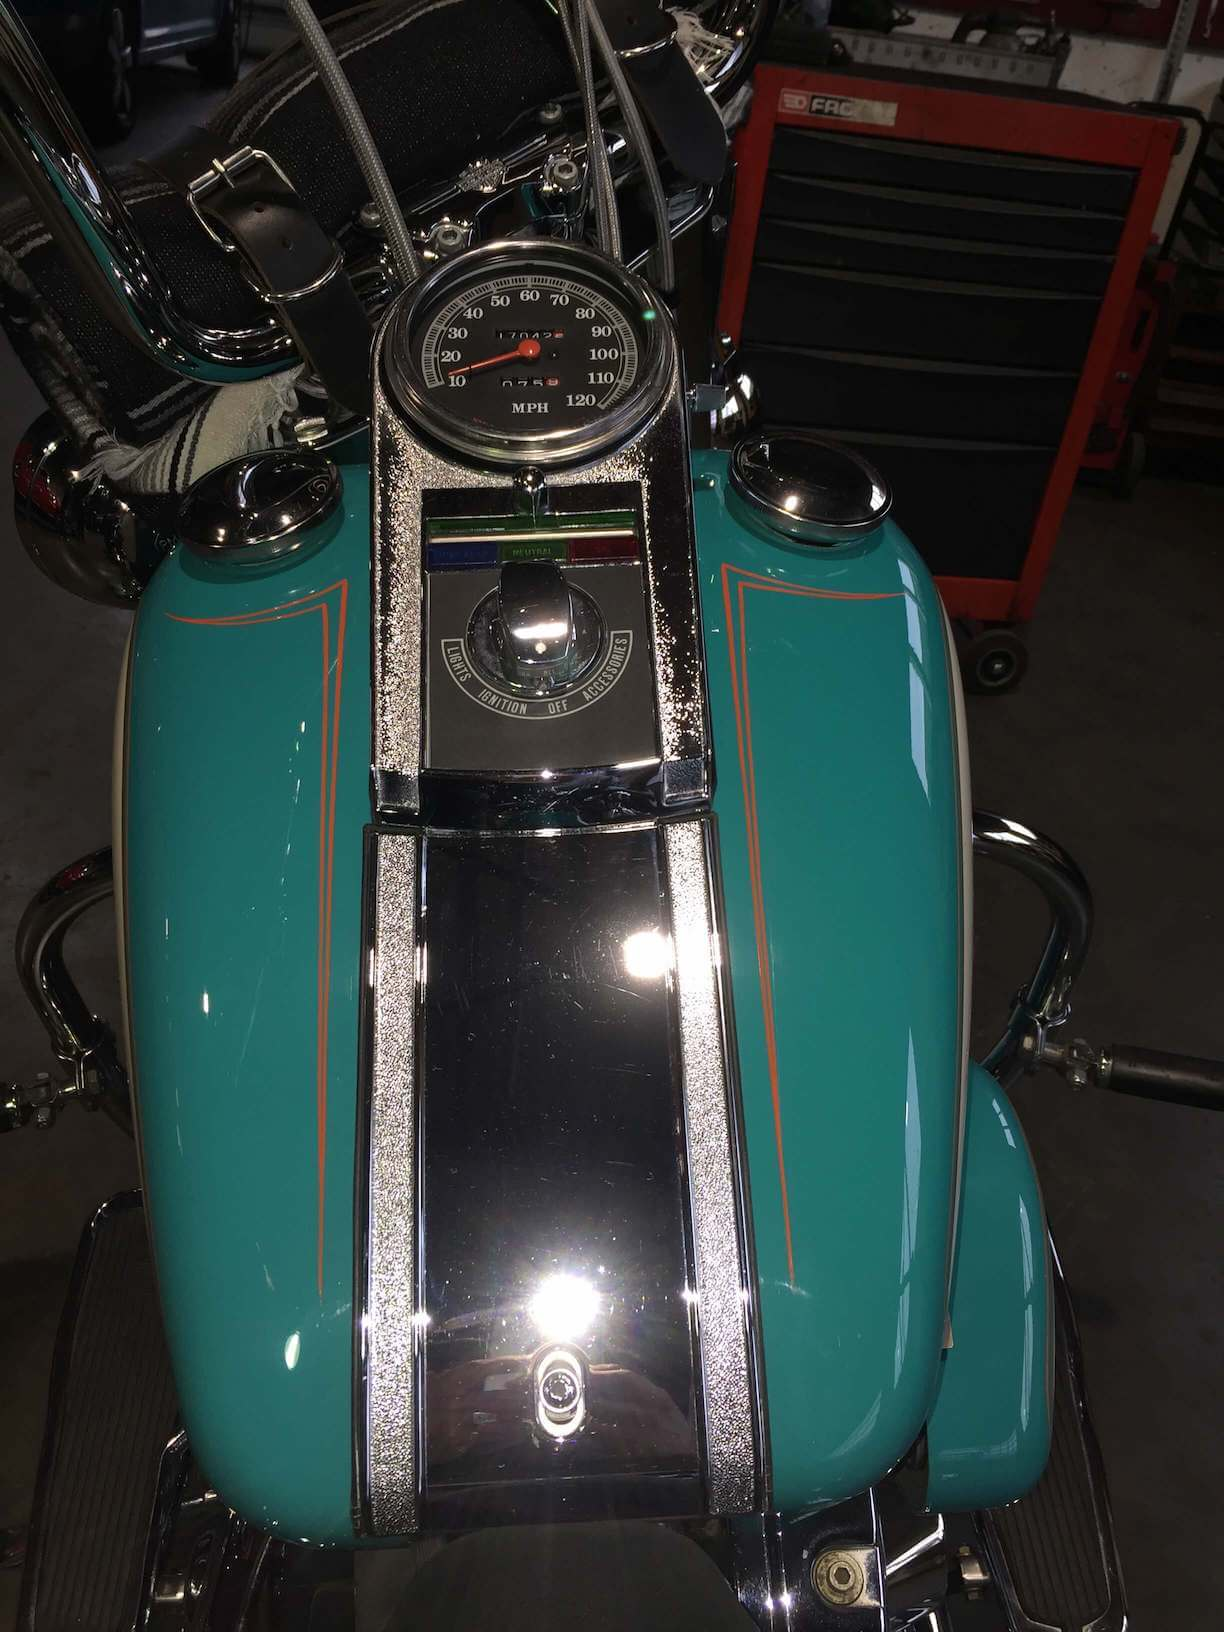 pinstripe brandstof tank Harley Davidson motor